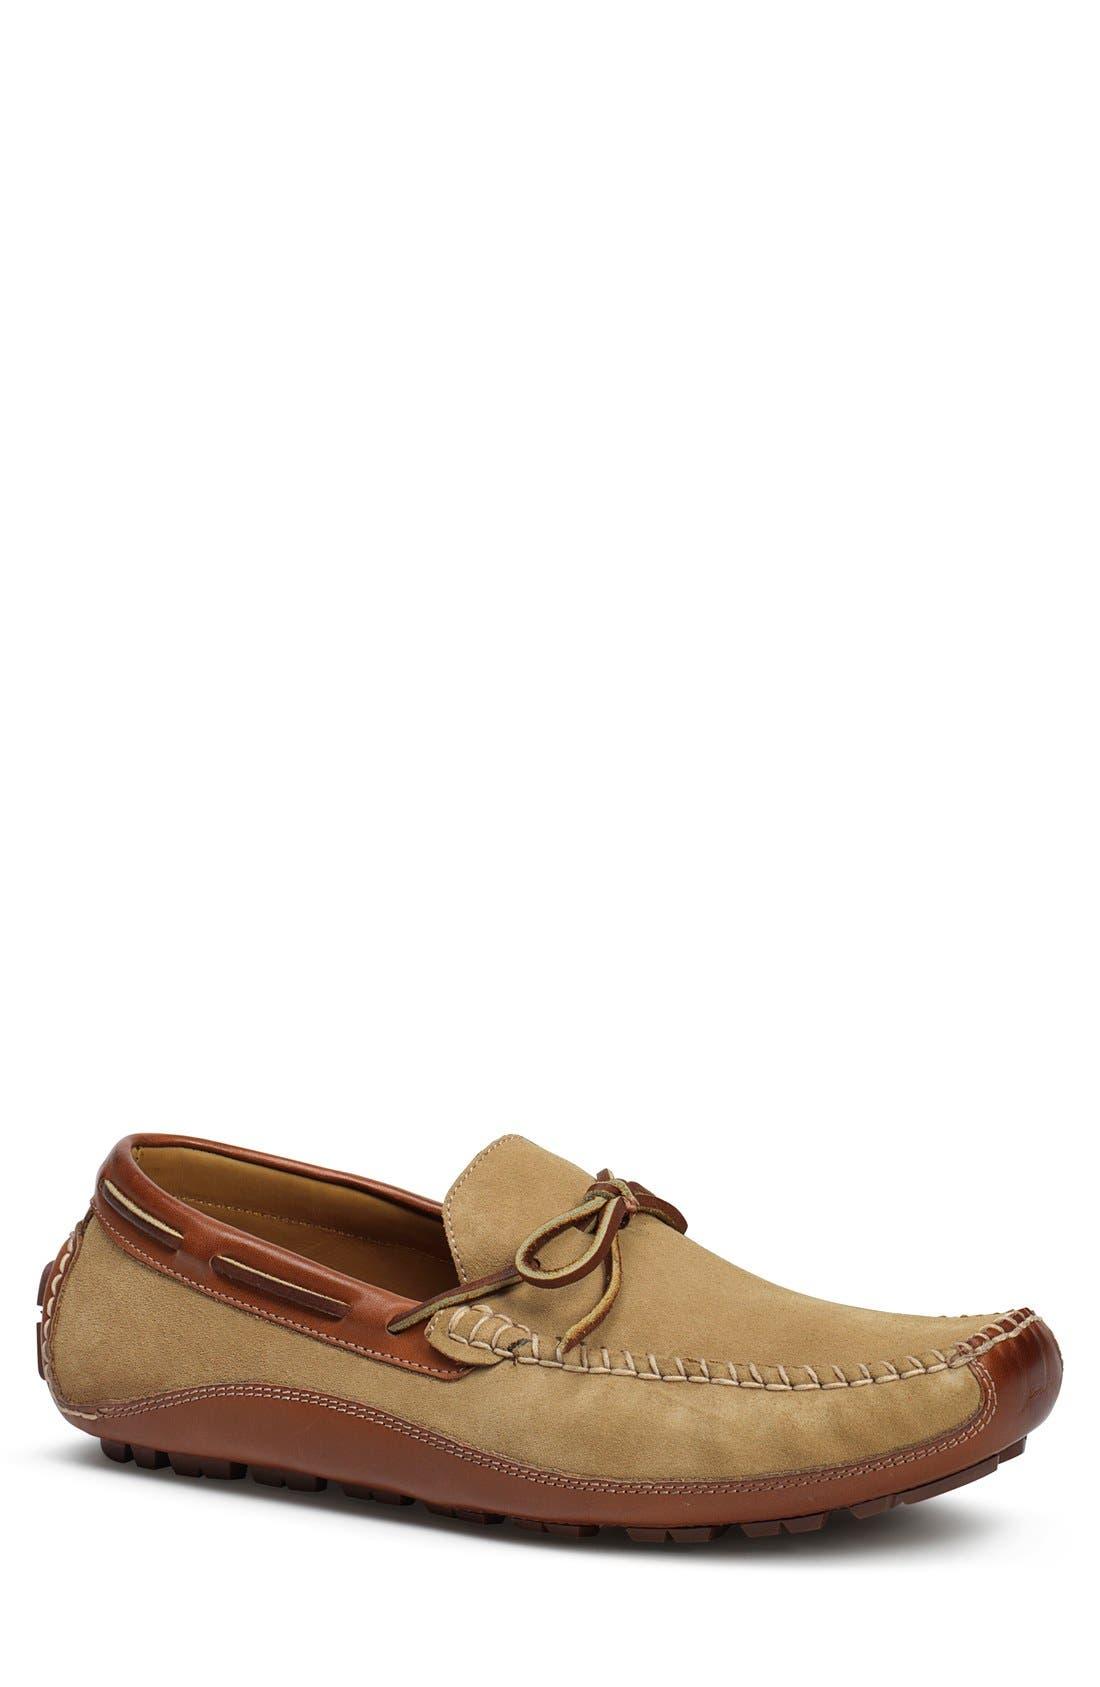 'Drake' Leather Driving Shoe,                             Main thumbnail 6, color,